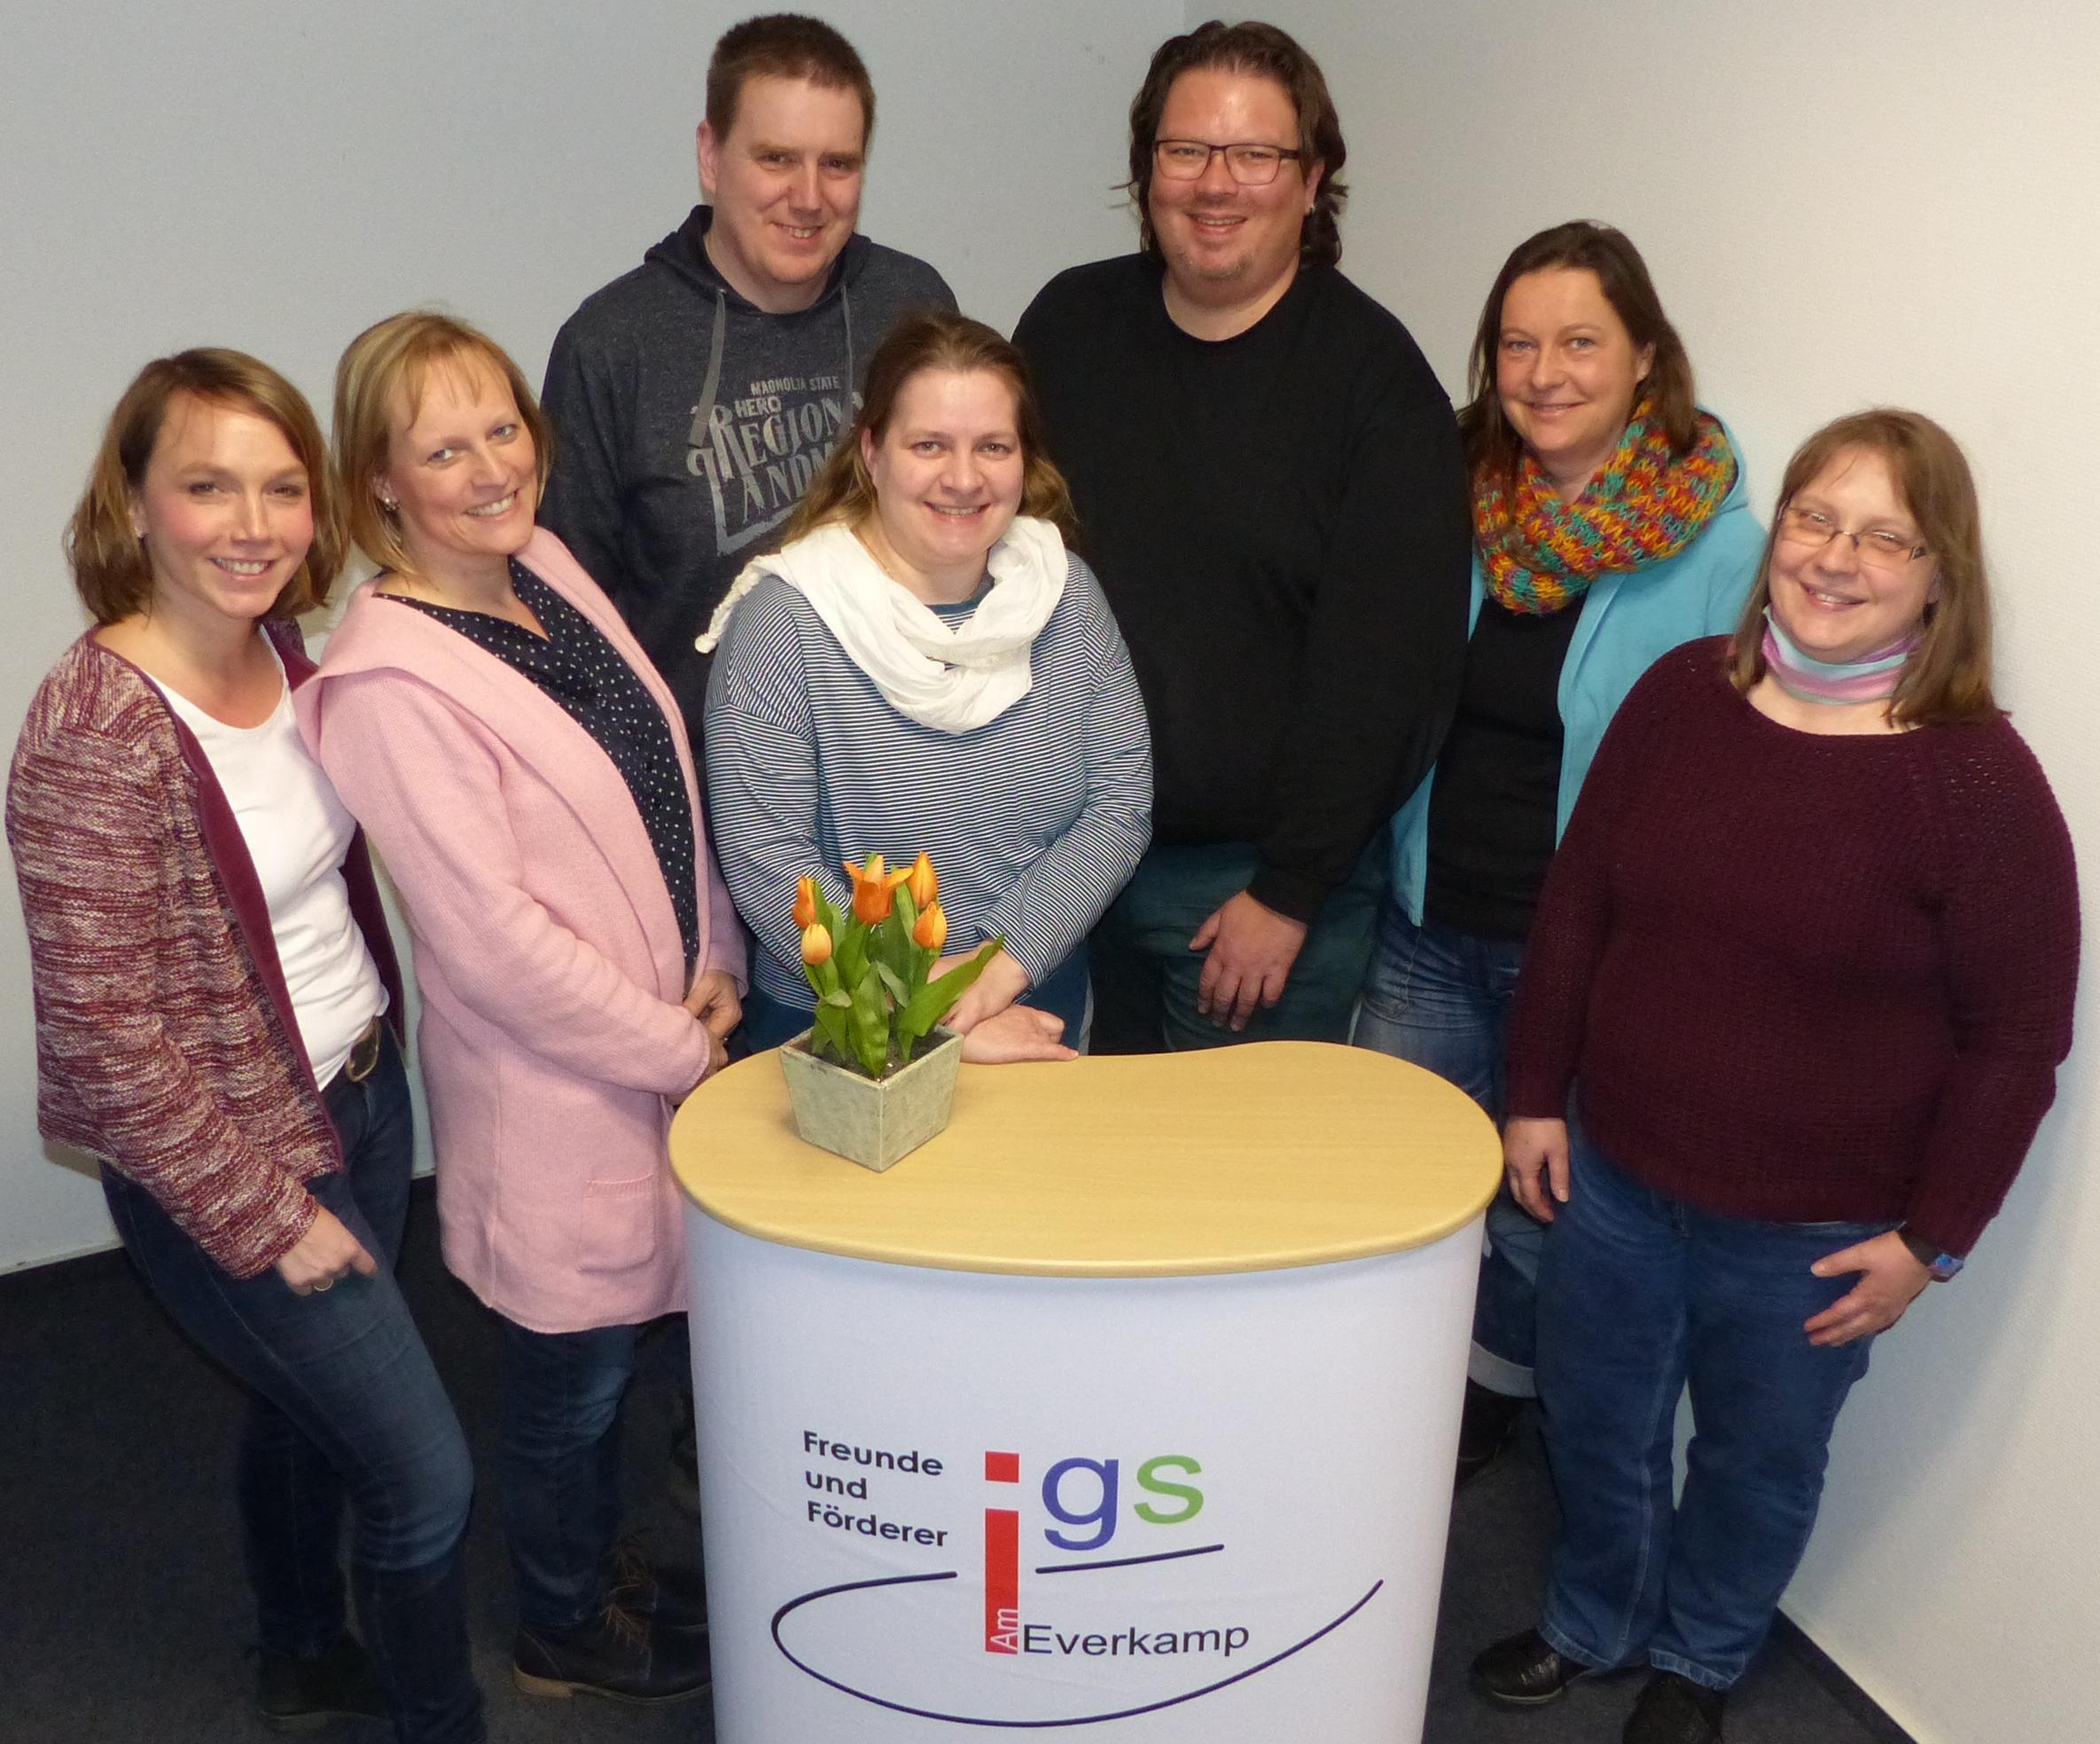 Förderverein mit neuem Vorstand – IGS Am Everkamp